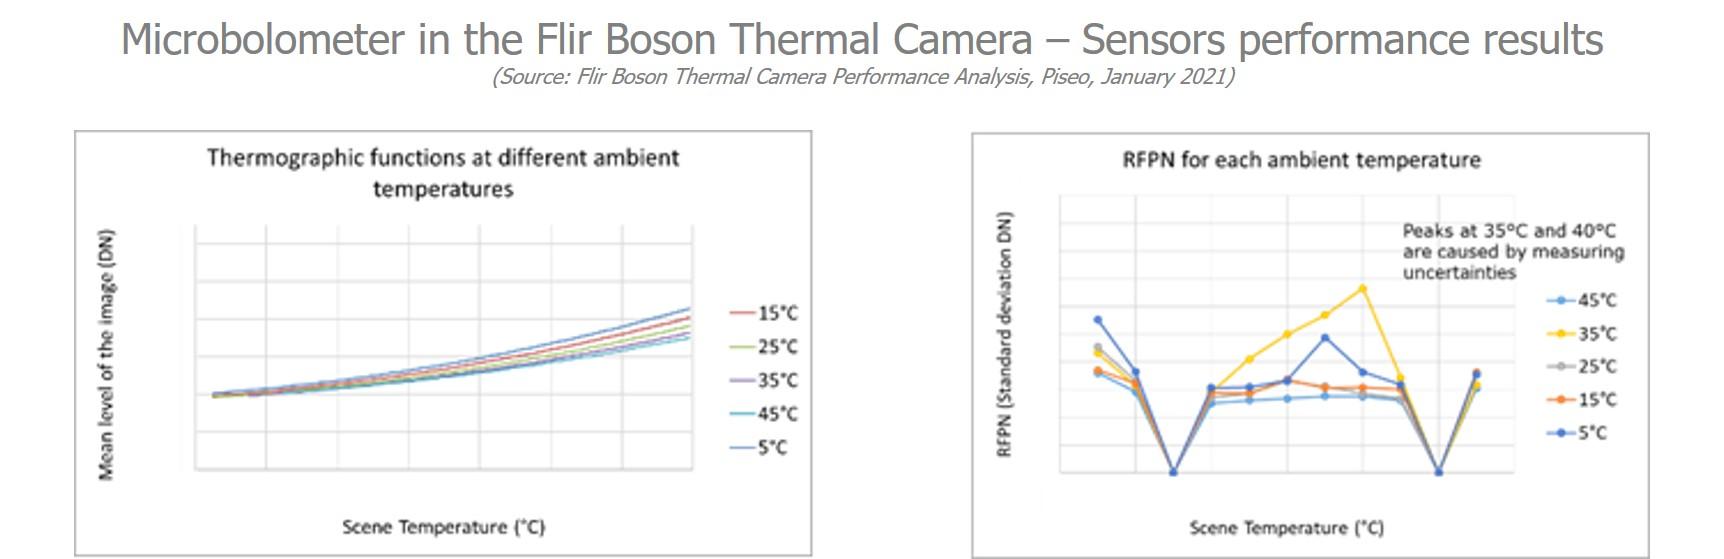 Microbolometer in the FLIR Boson Thermal Camera – Sensors performance results - Piséo